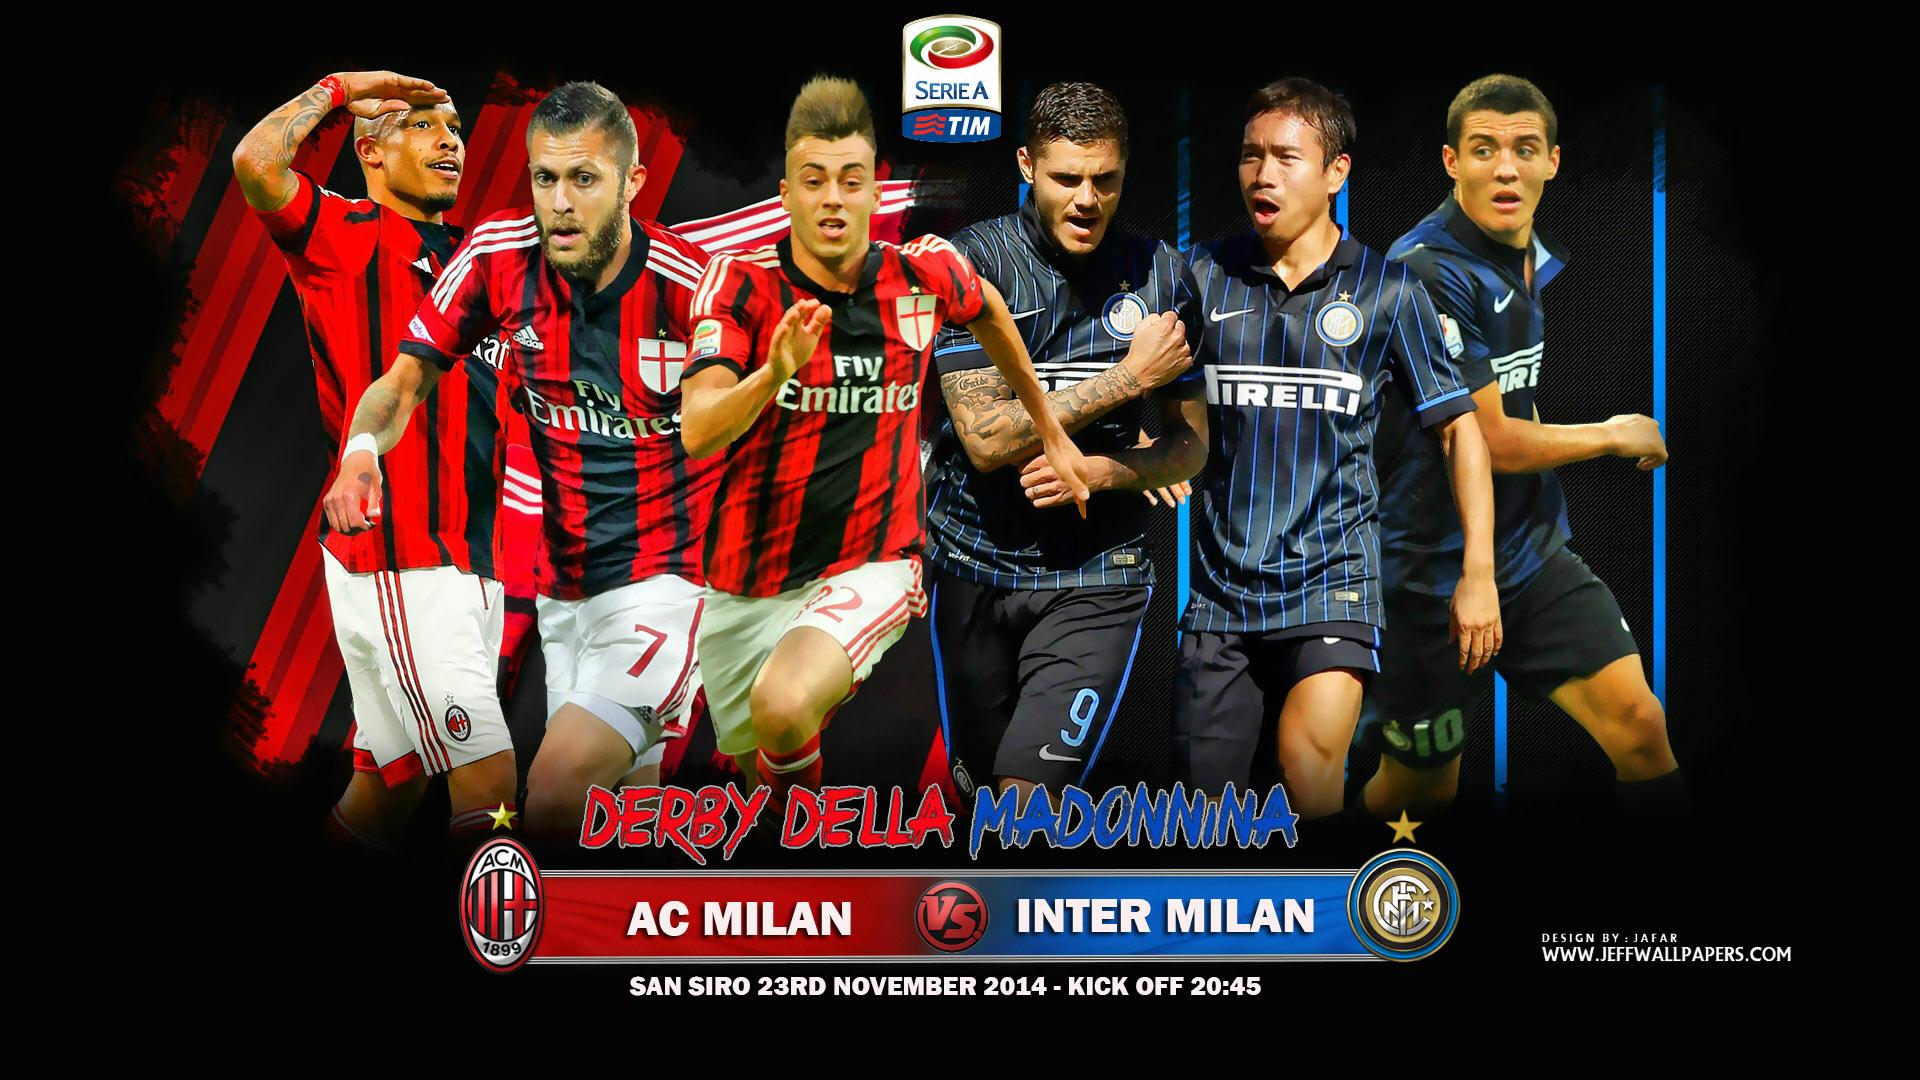 AC Milan vs Inter Milan 2014 2015 Derby Della Madonnina Wallpaper 1920x1080